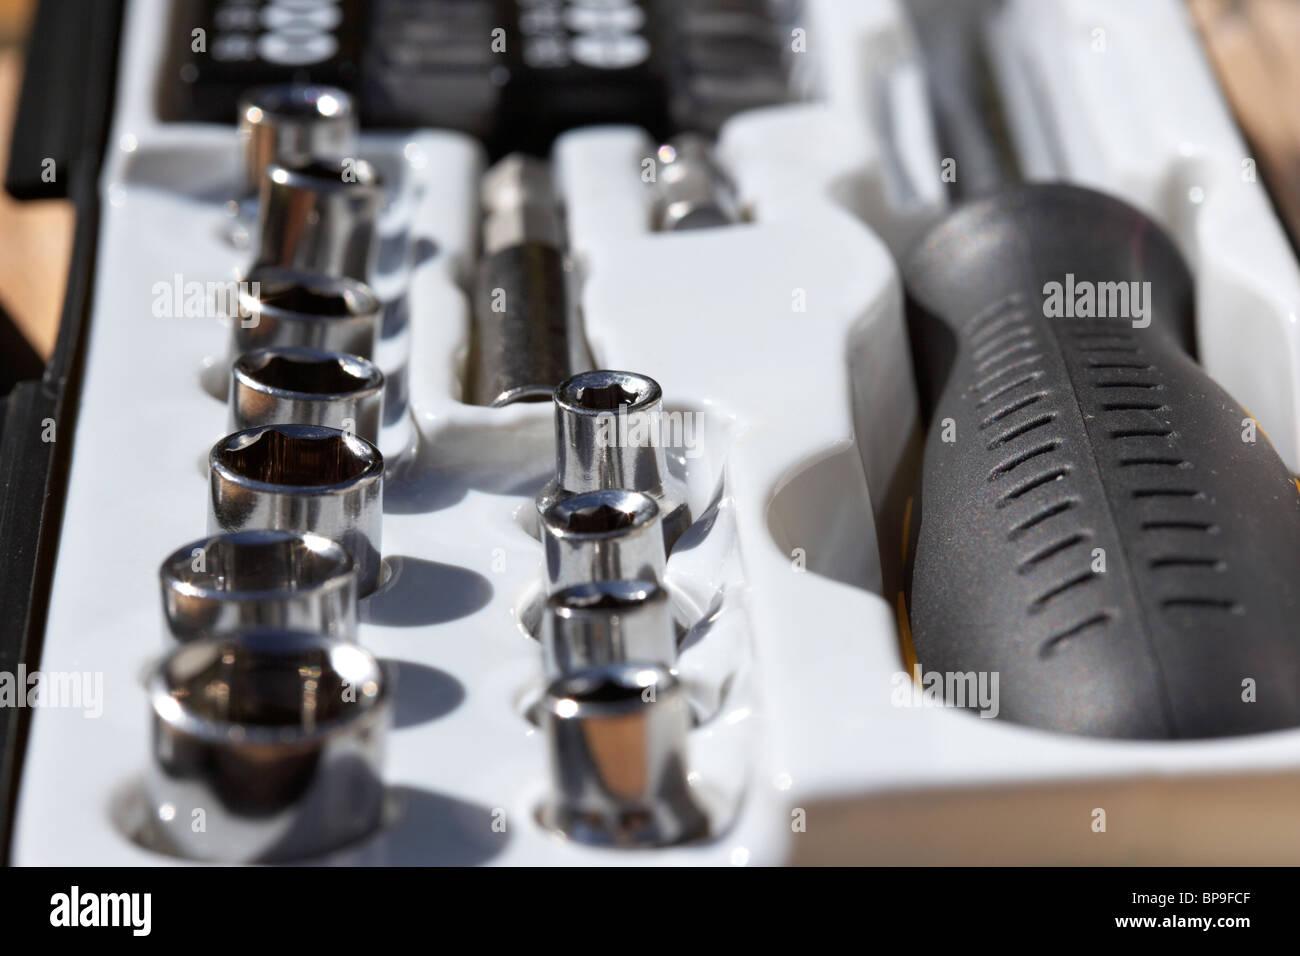 small diy household tool ratchet set sockets Stock Photo